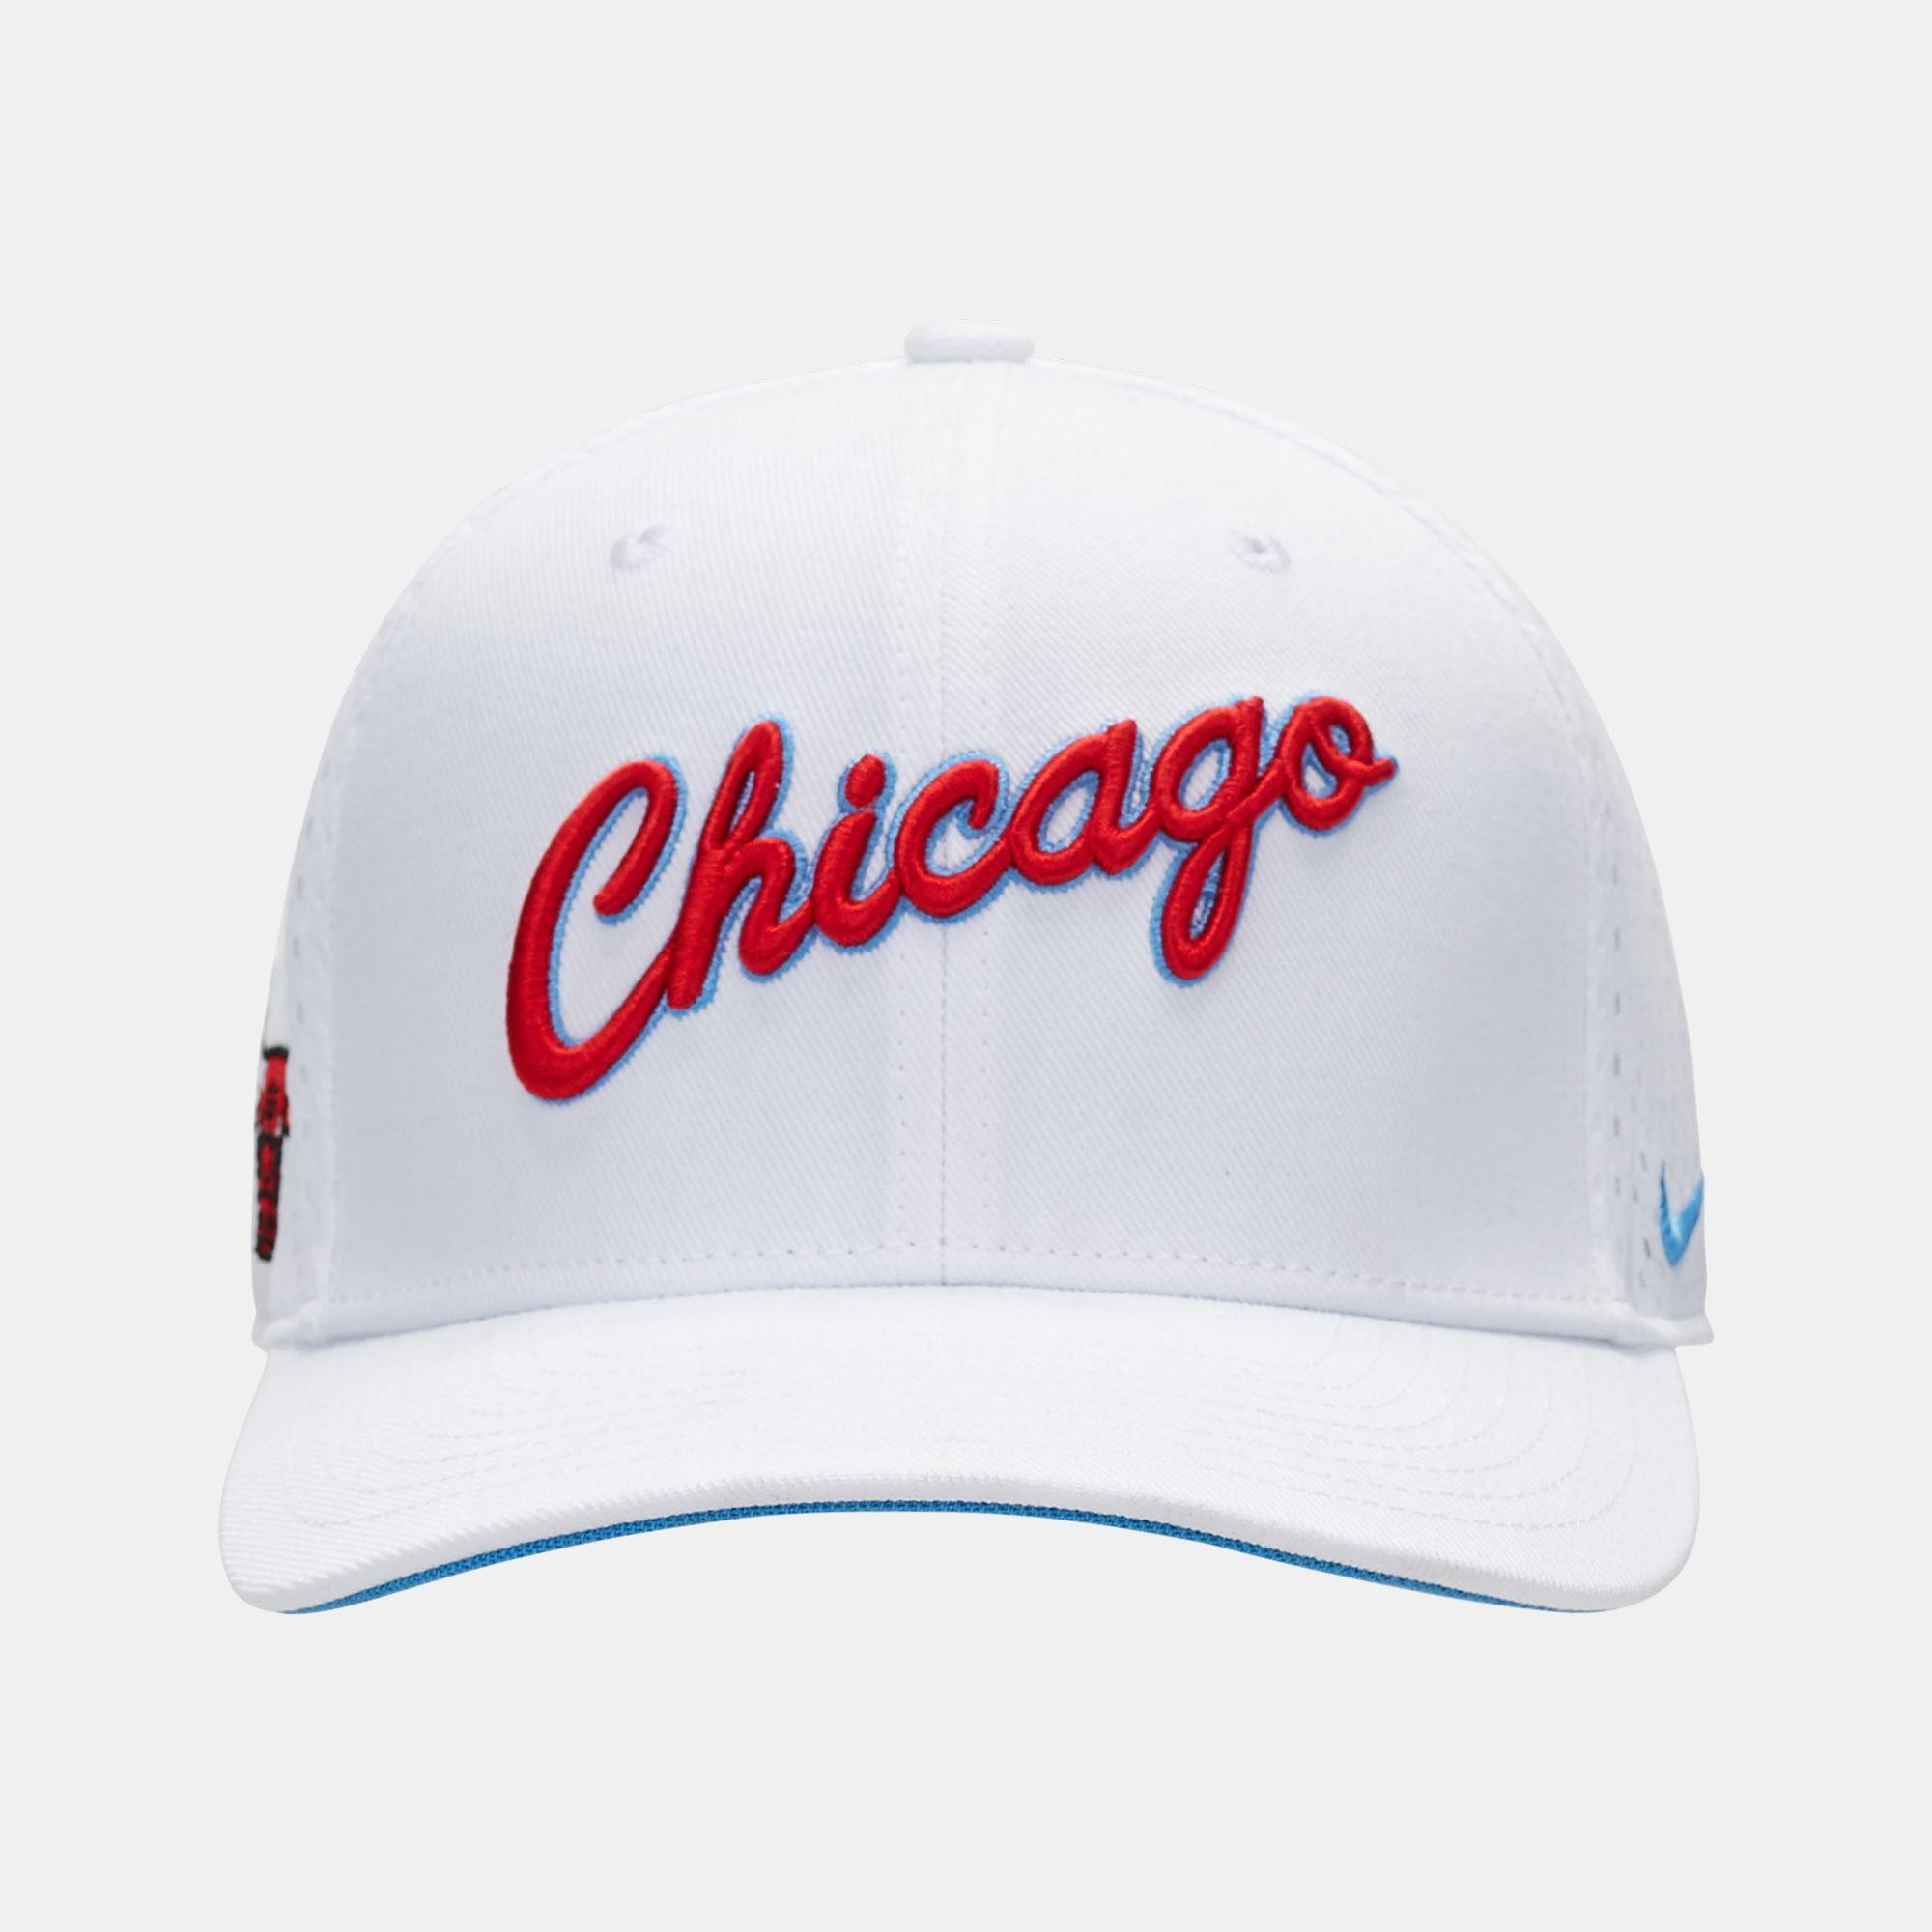 25df1ed2 Nike NBA Chicago Bulls City Edition Classic99 Cap   Caps   Caps and ...